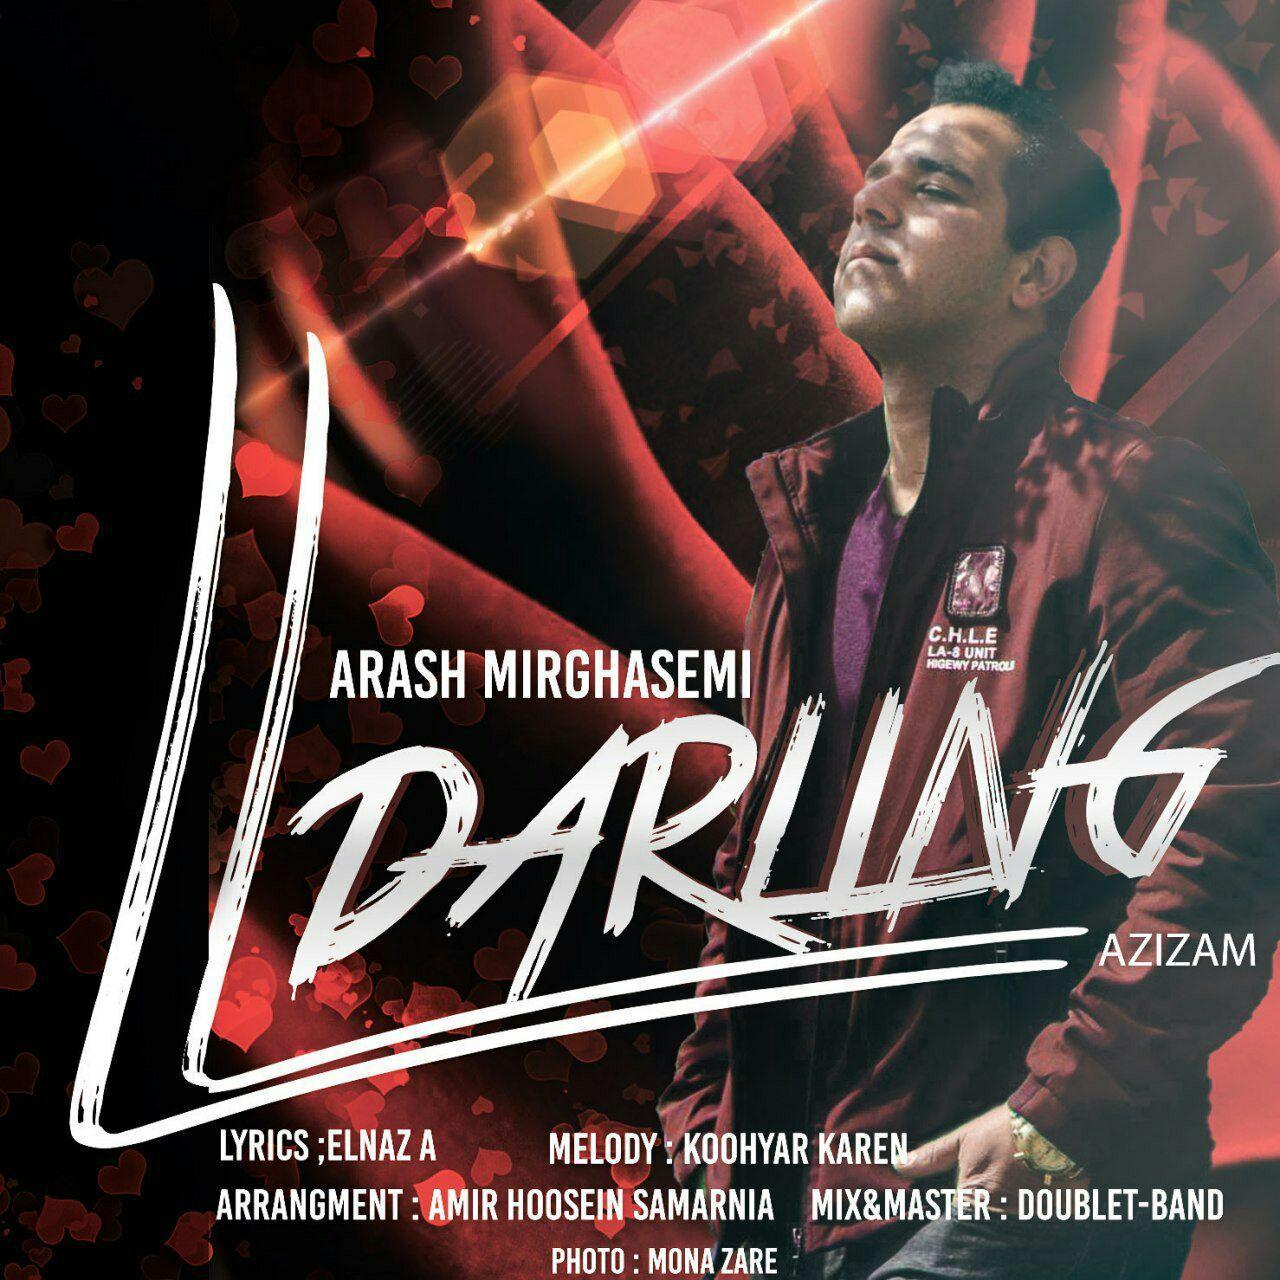 Arash Mirghasemi – Azizam